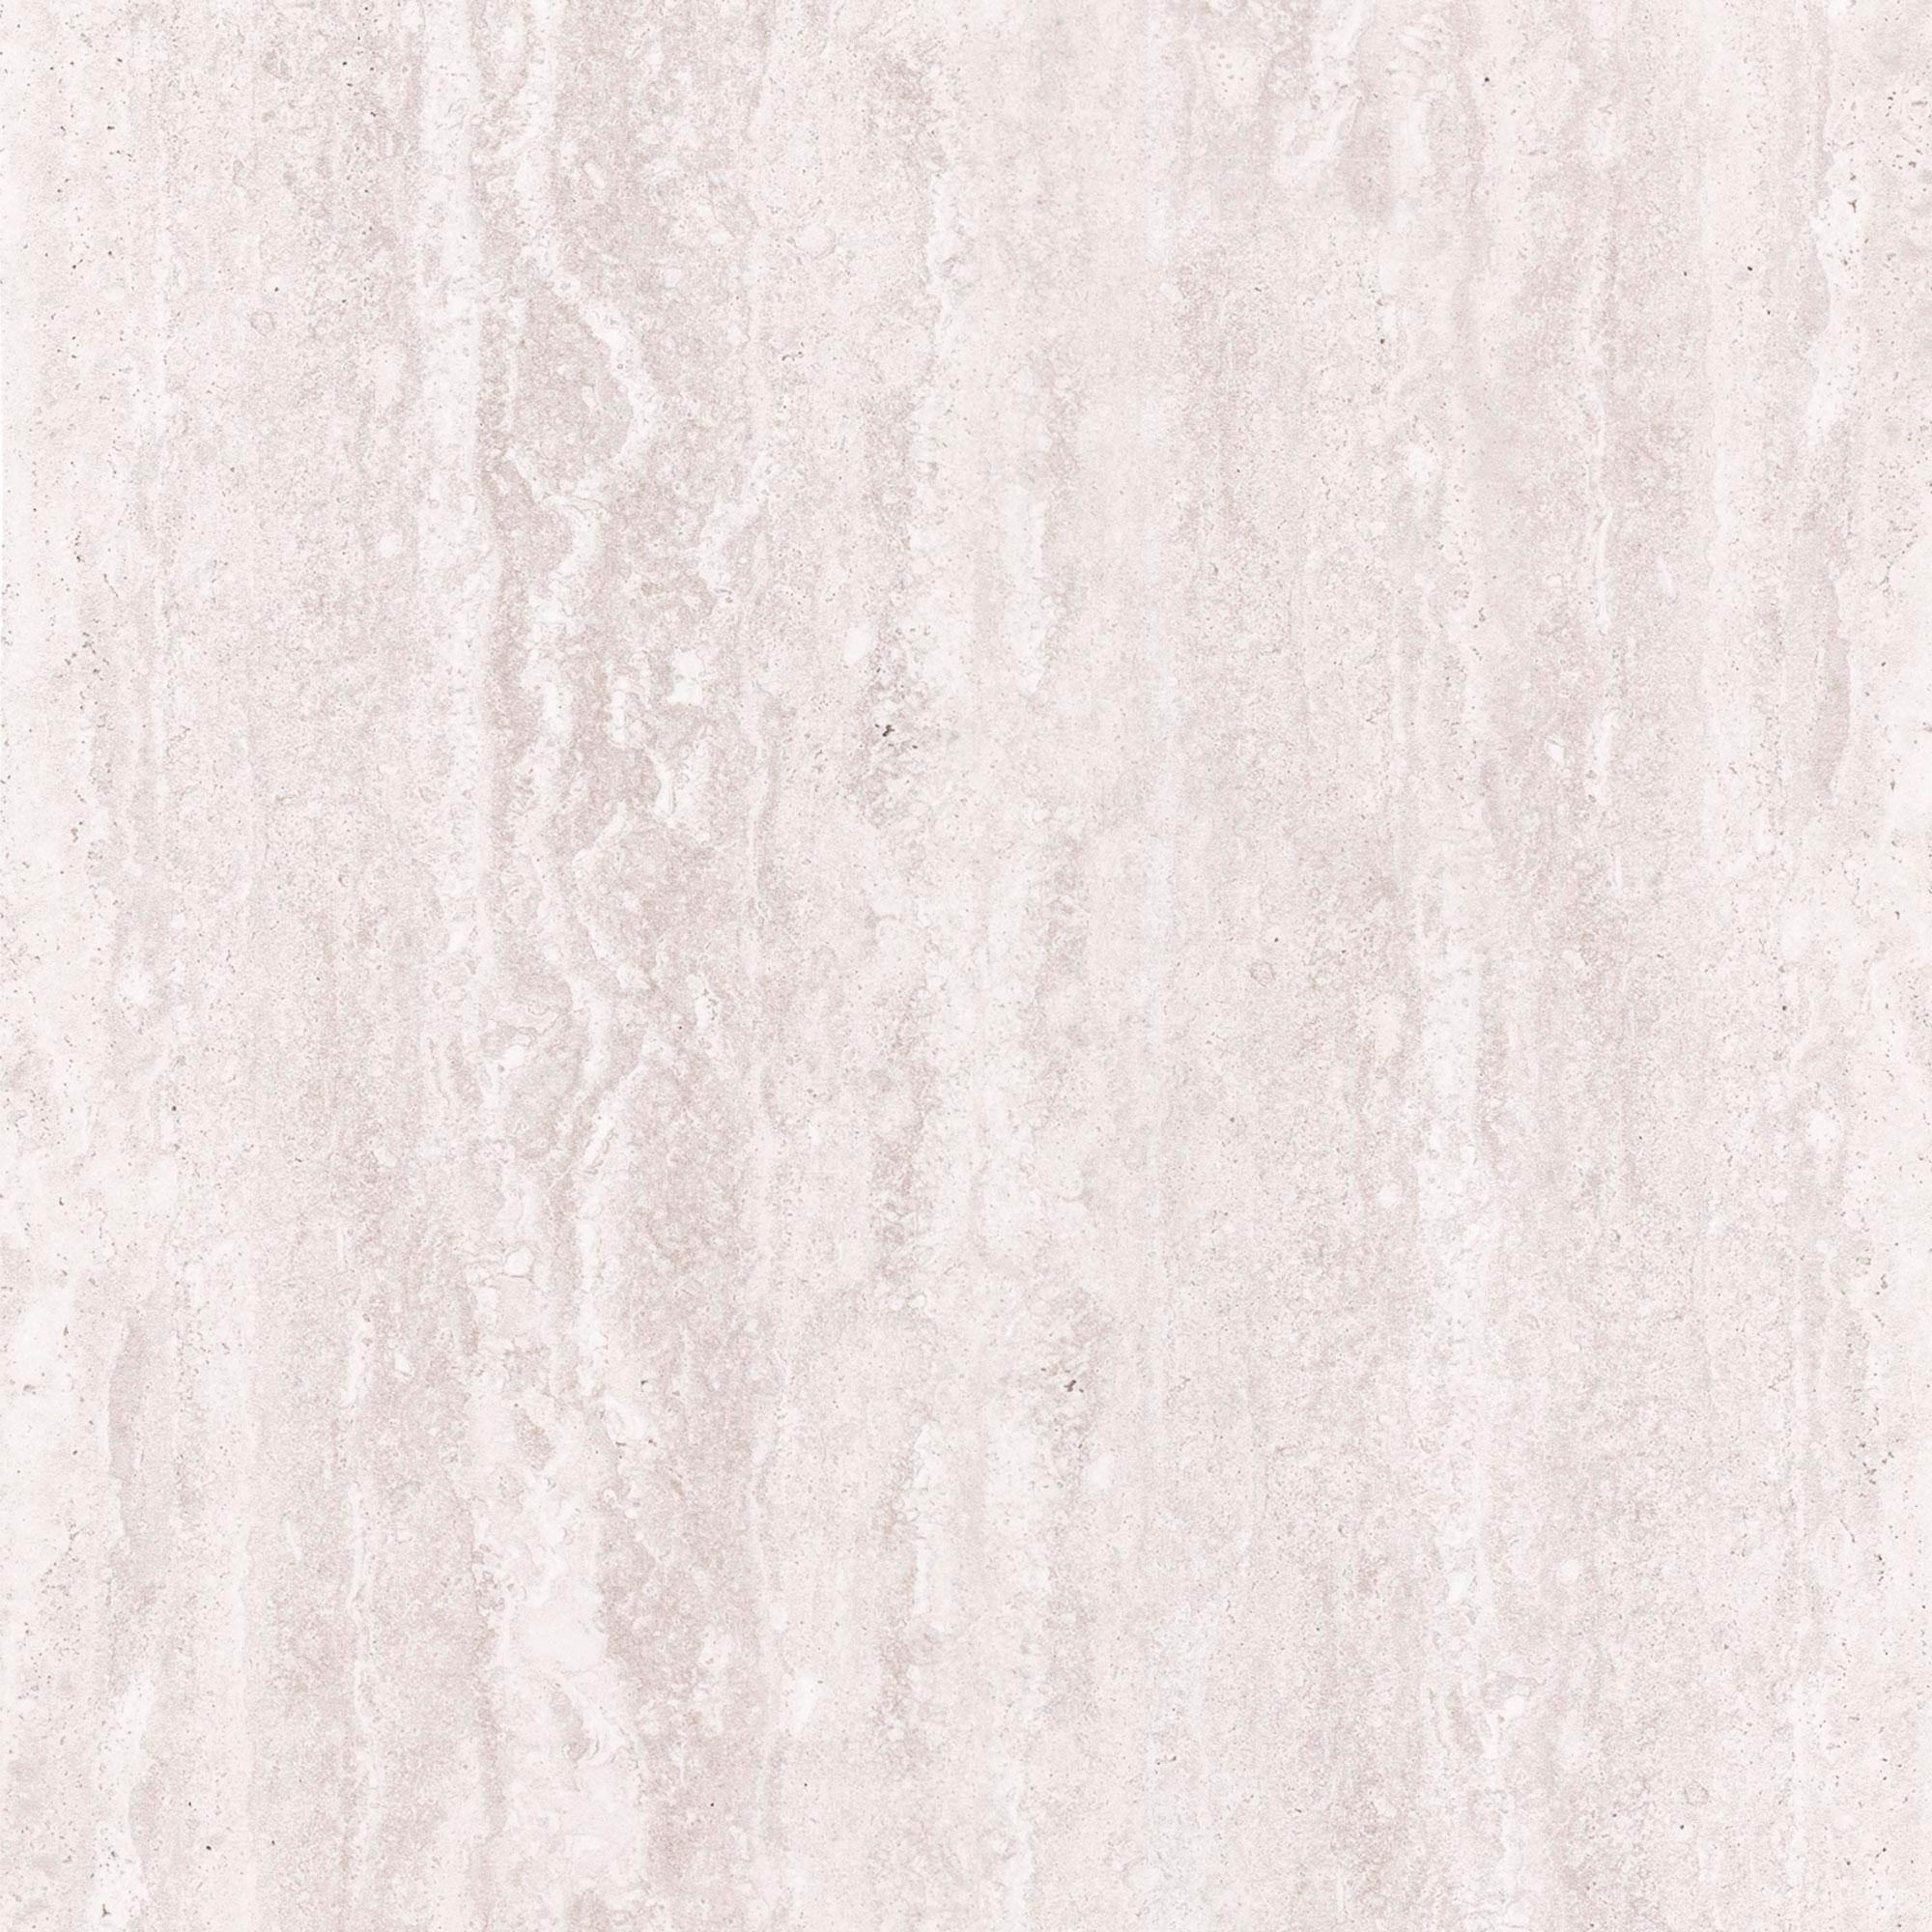 Напольная плитка Ceramika Konskie Salomea 45x45 (1,62) напольная плитка ceramika konskie quarzite bianca rekt lap 60x60 1 44